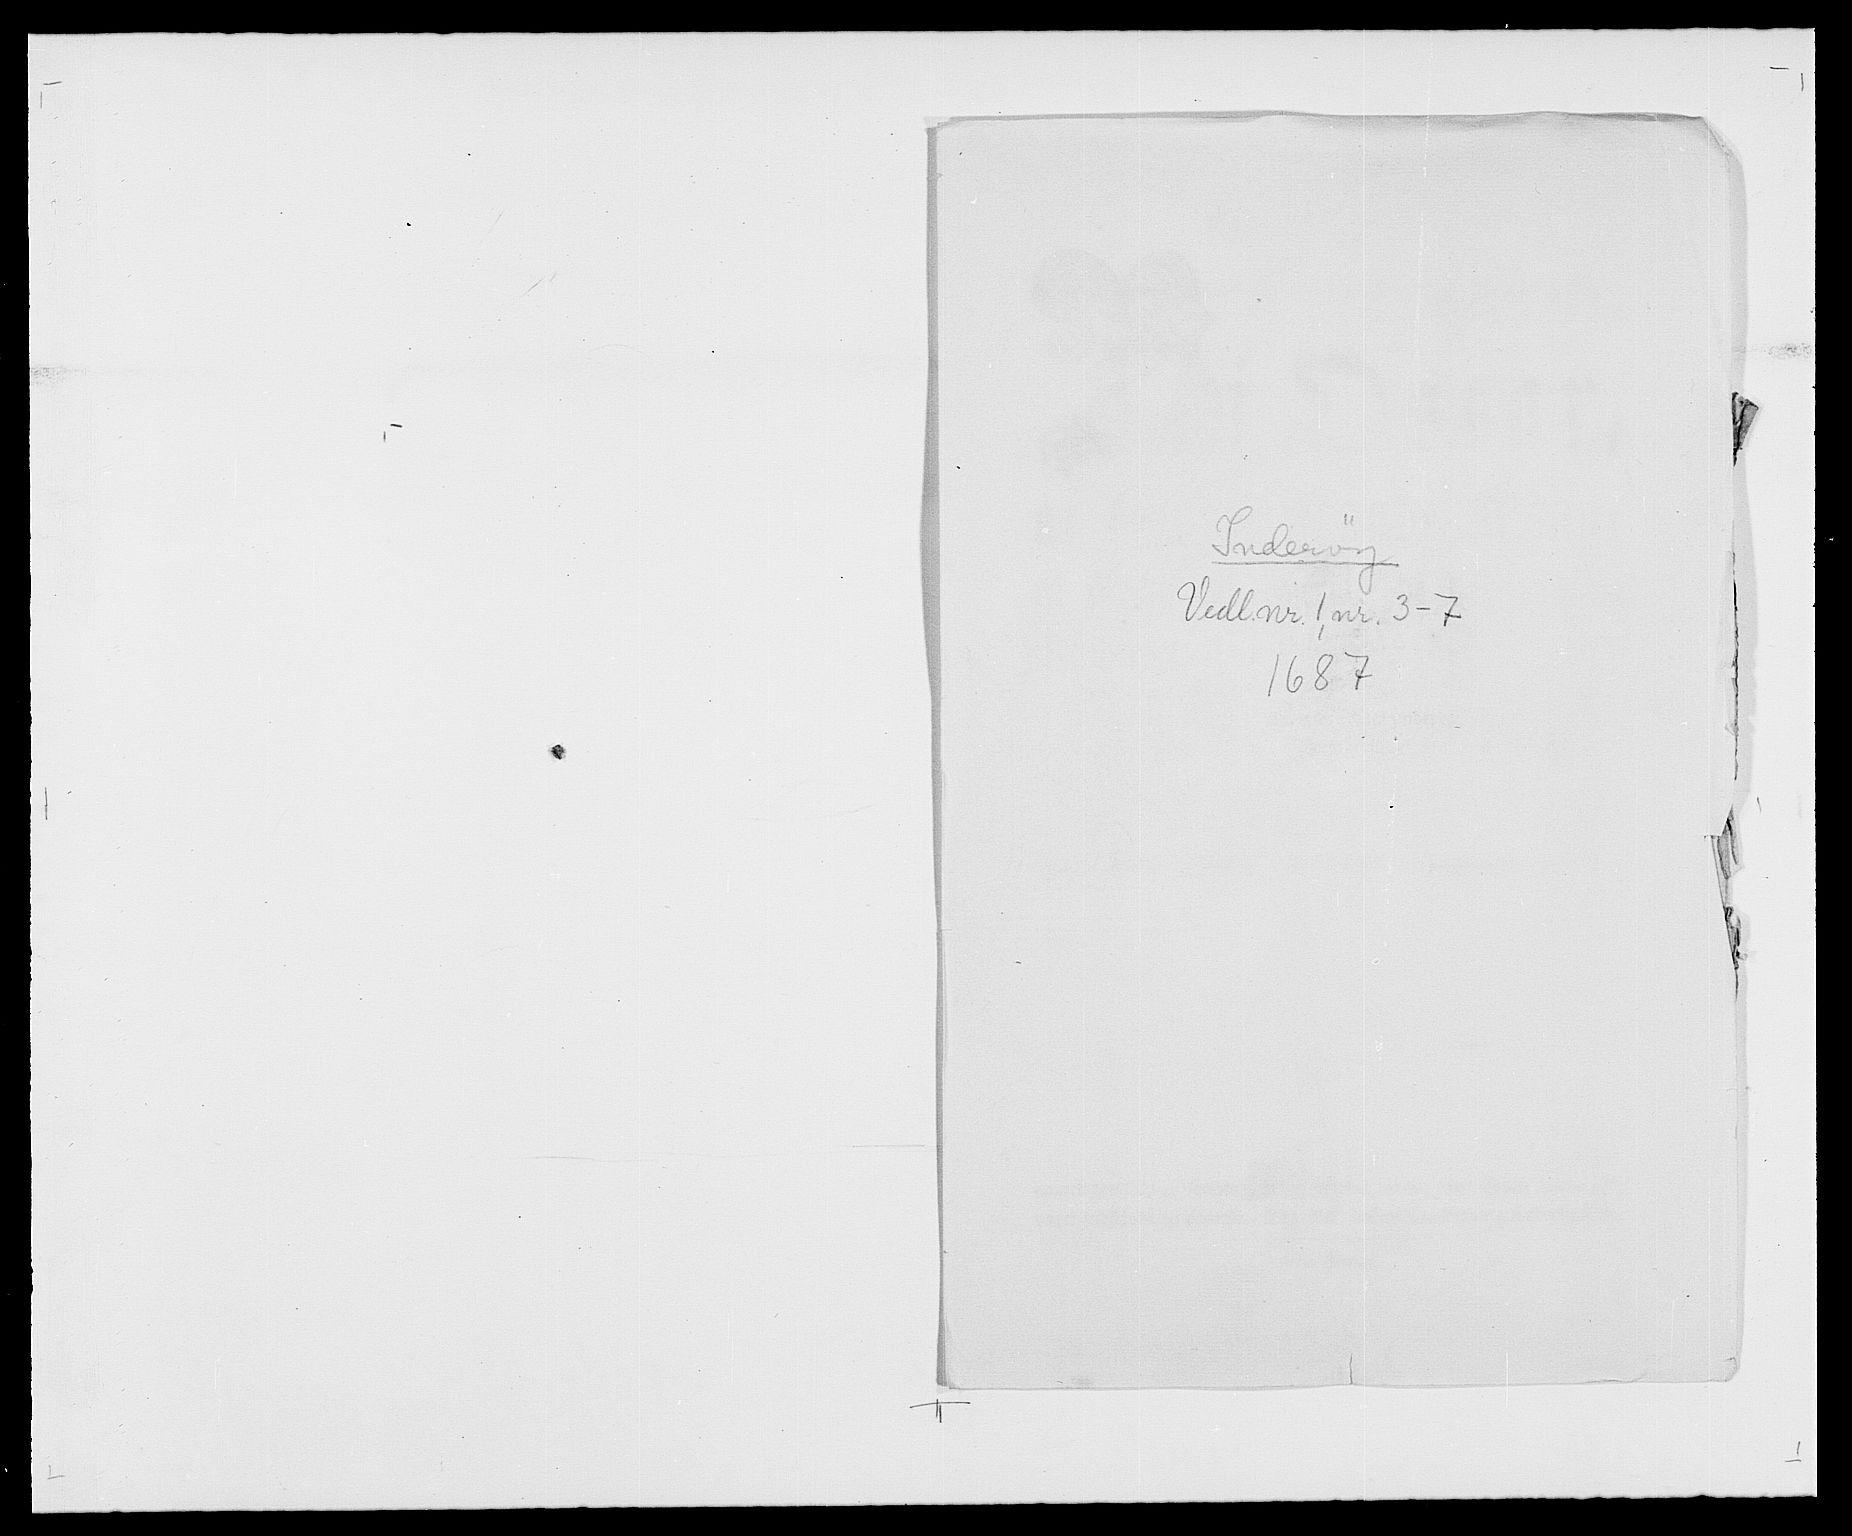 RA, Rentekammeret inntil 1814, Reviderte regnskaper, Fogderegnskap, R63/L4306: Fogderegnskap Inderøy, 1687-1689, s. 204